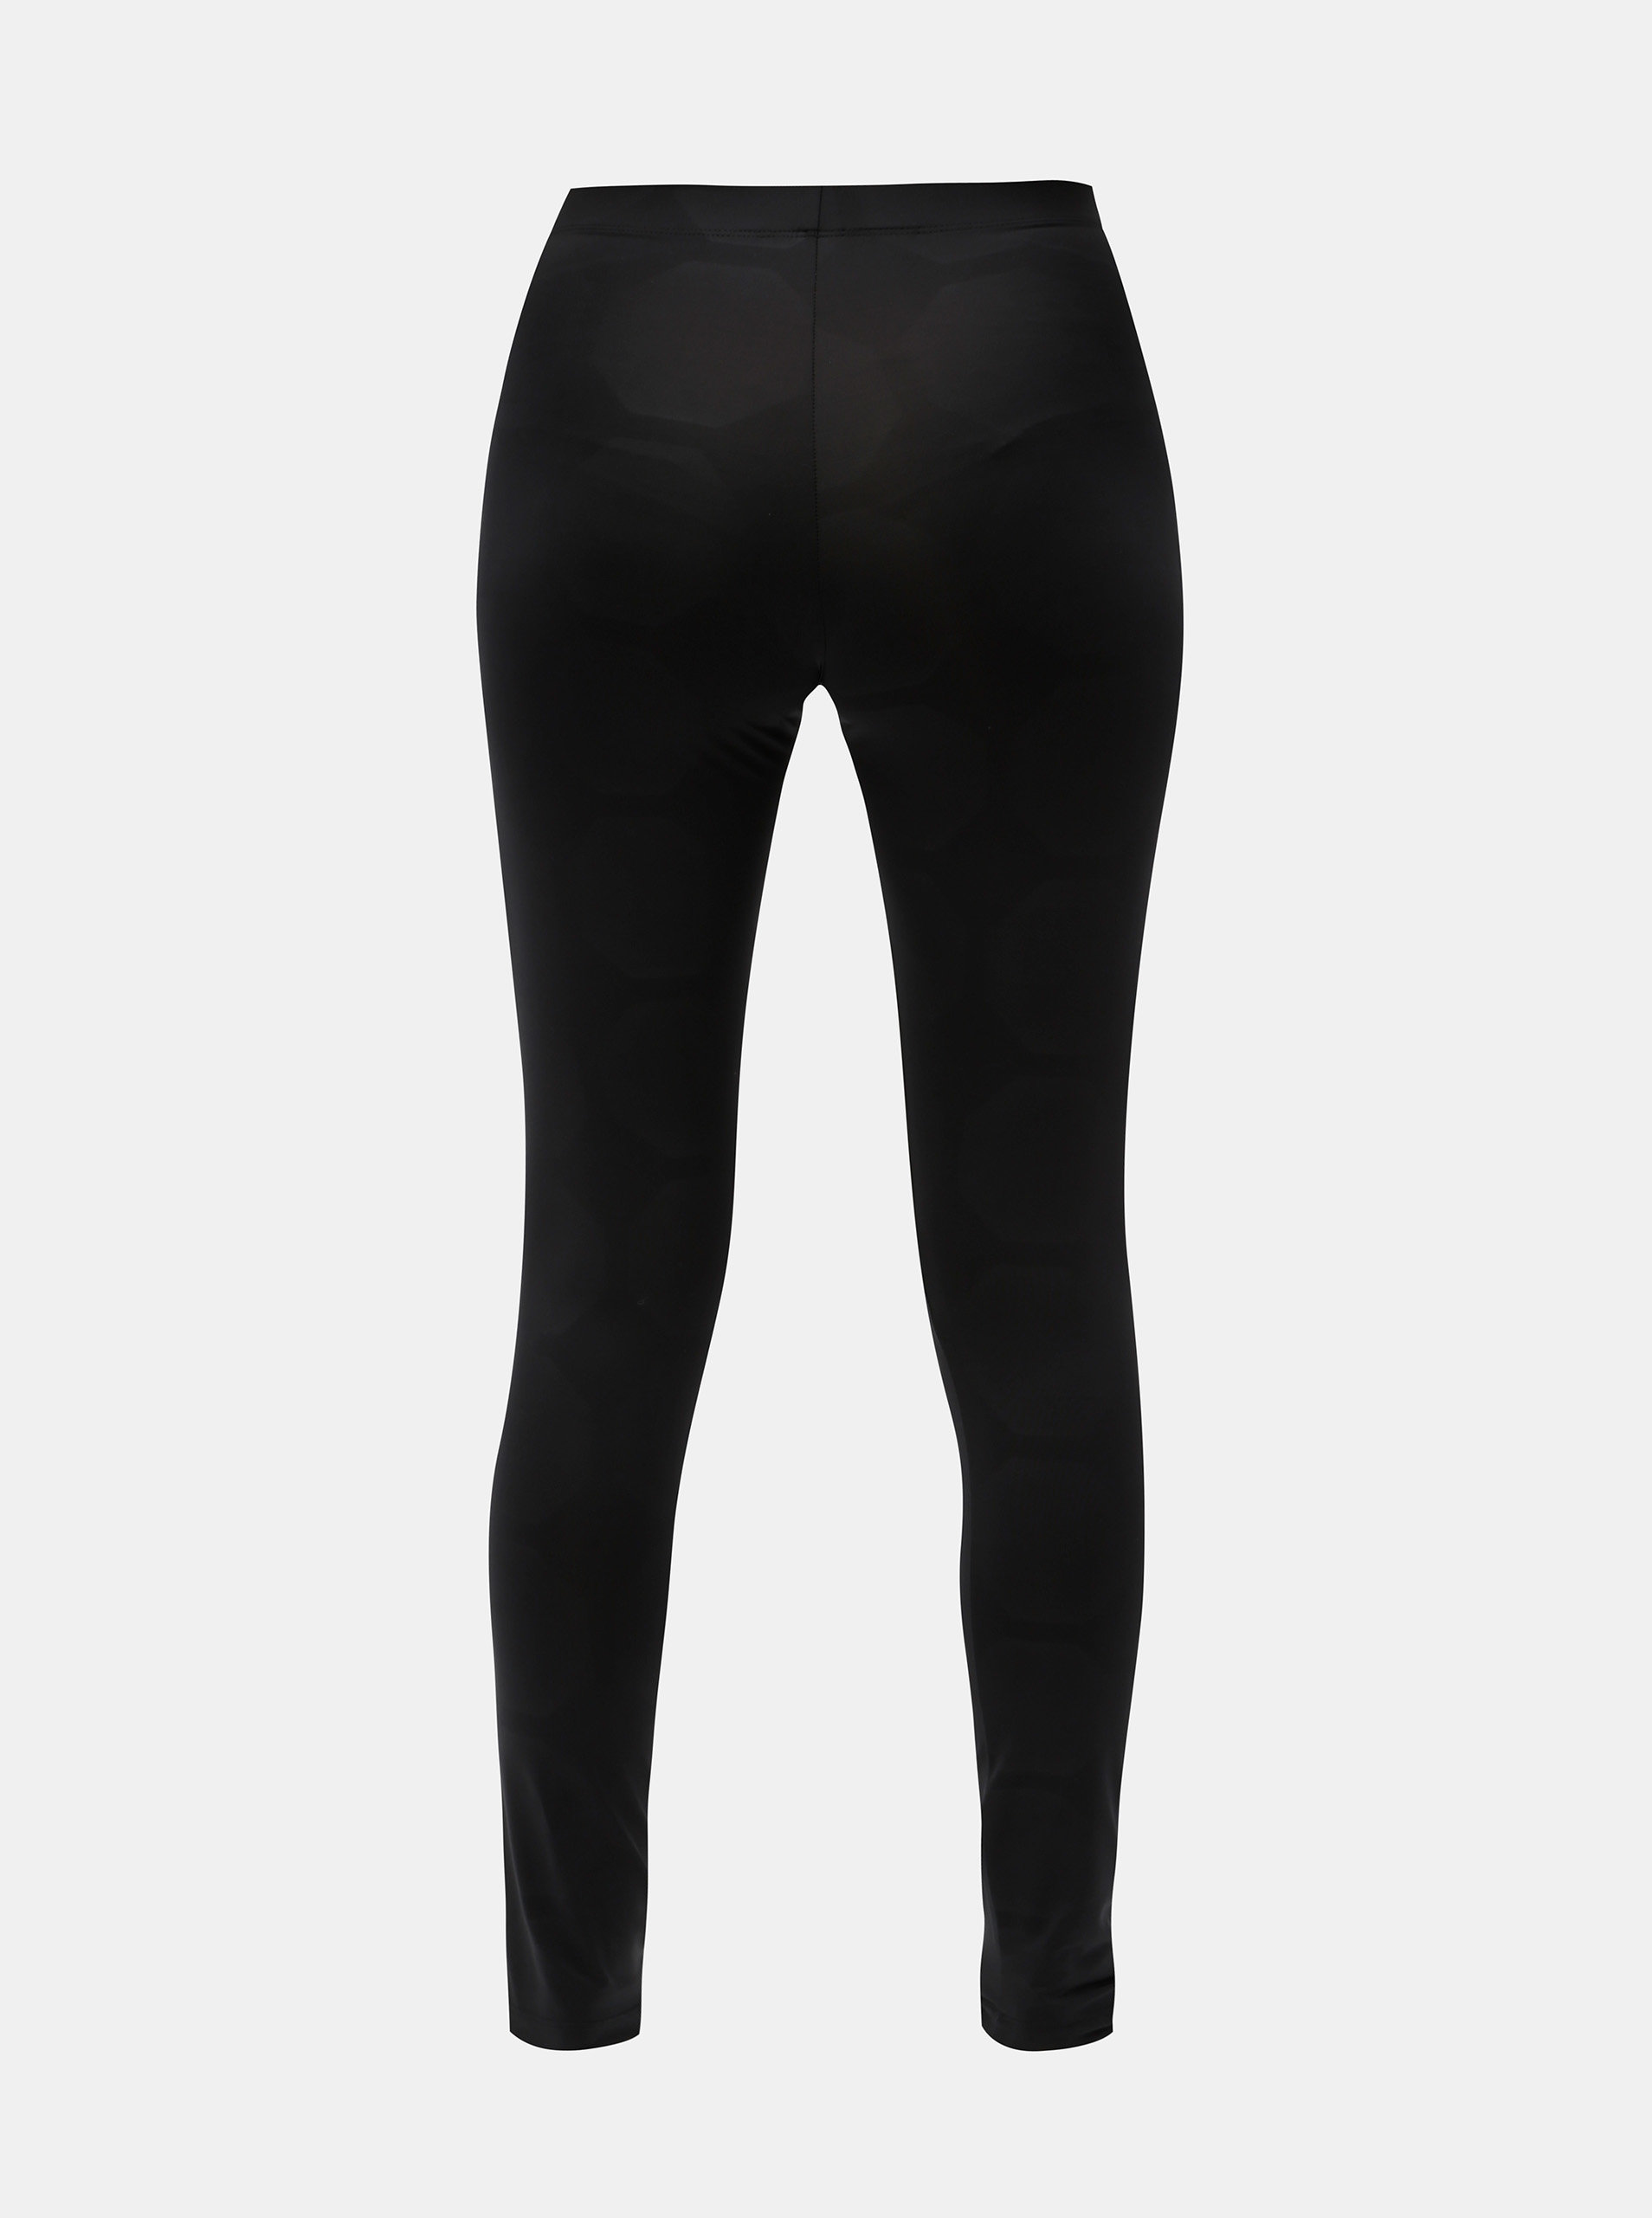 Černé dámské legíny s fotbalovým vzorem adidas Originals Tight ... 4e464e74c0